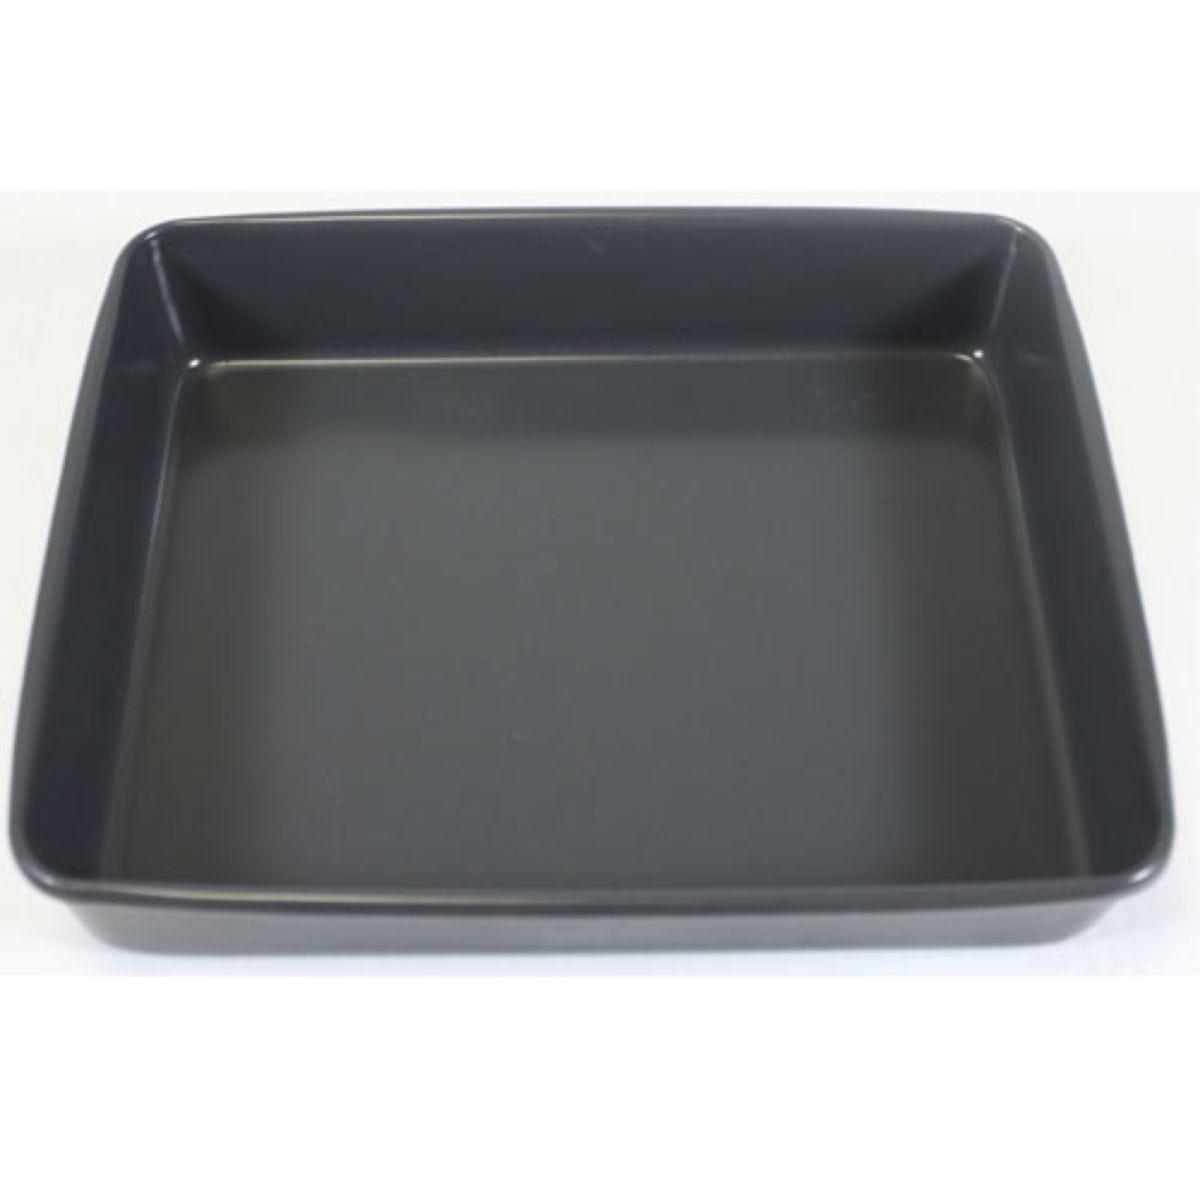 Robert Dyas Small Non-Stick Roast & Bake Pan